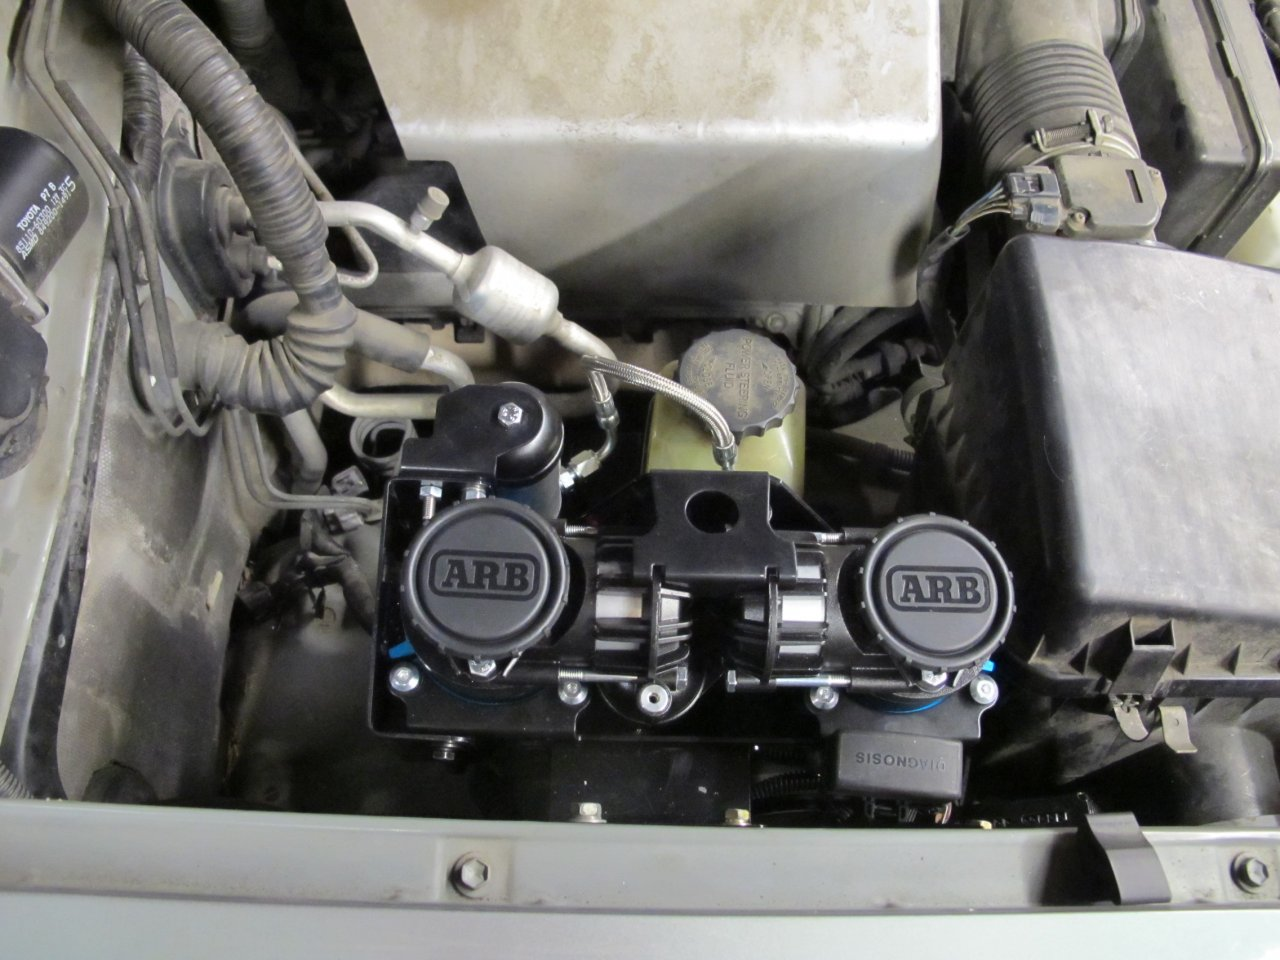 Arb Twin Compressor Mount Ih8mud Forum